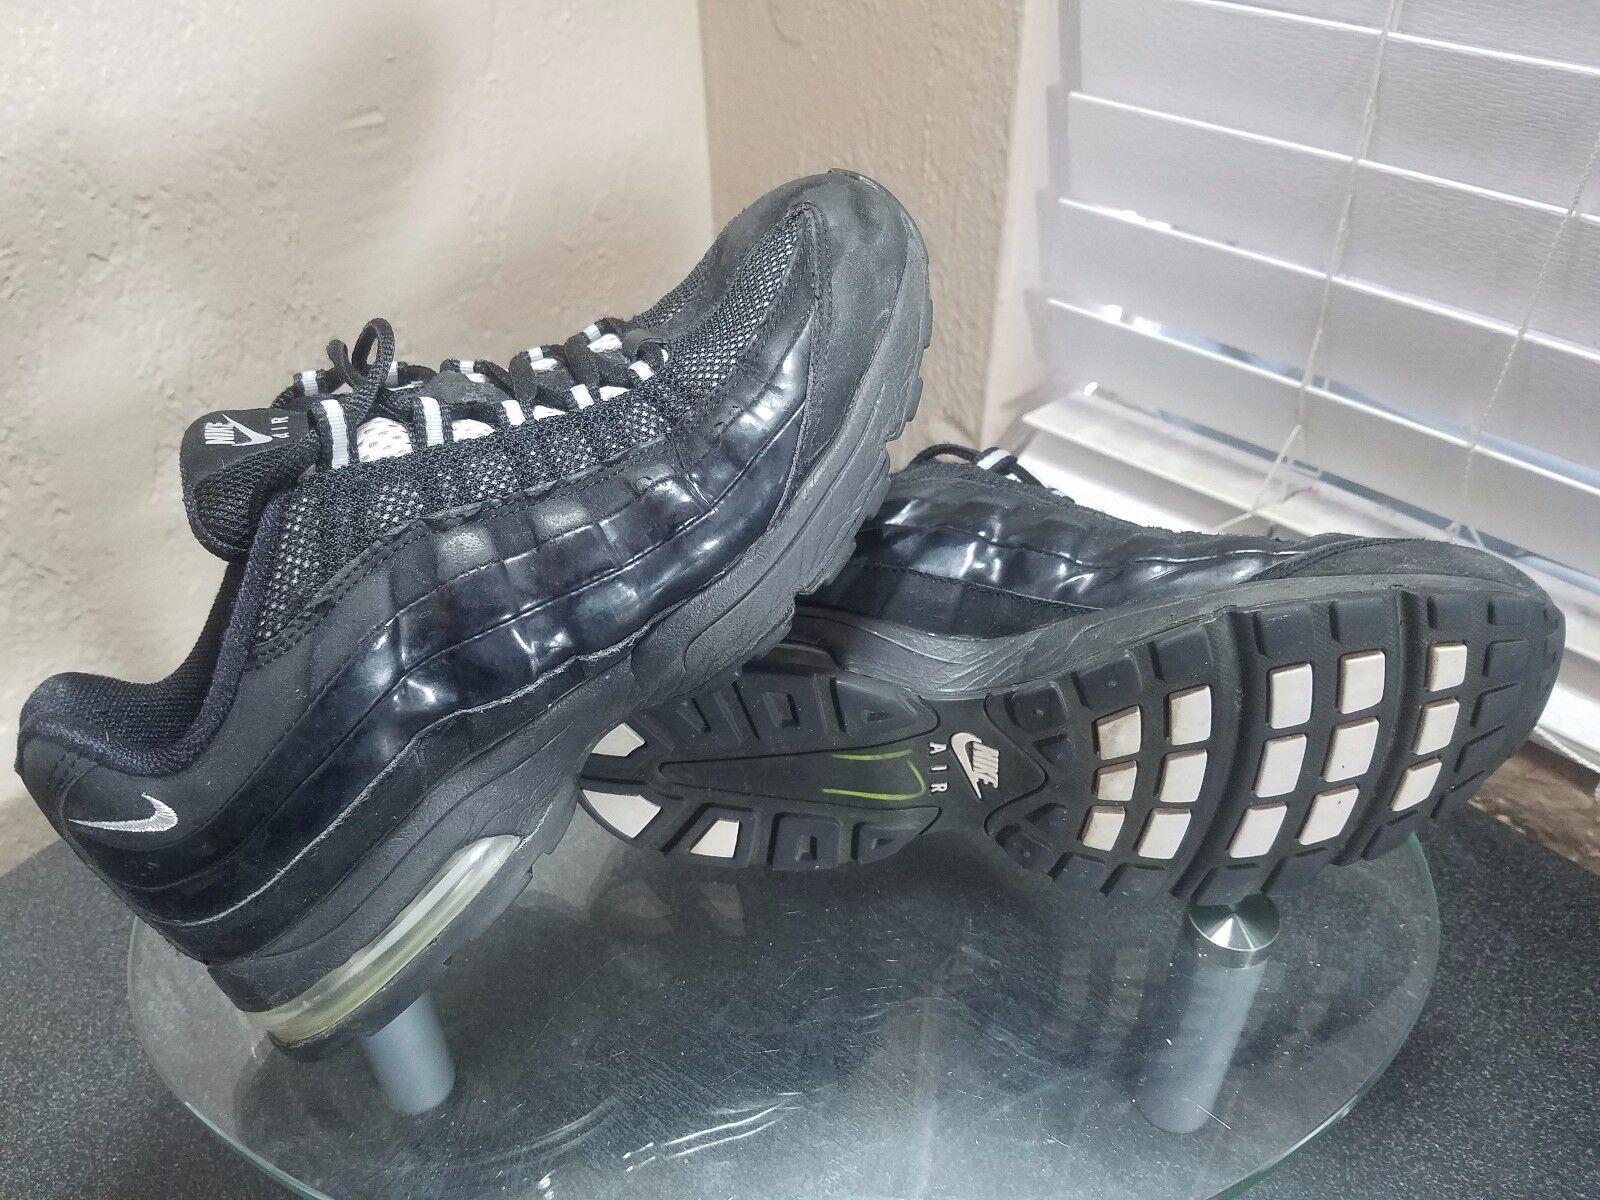 2007 Nike Air Max 95 Womens Comfortable Seasonal clearance sale